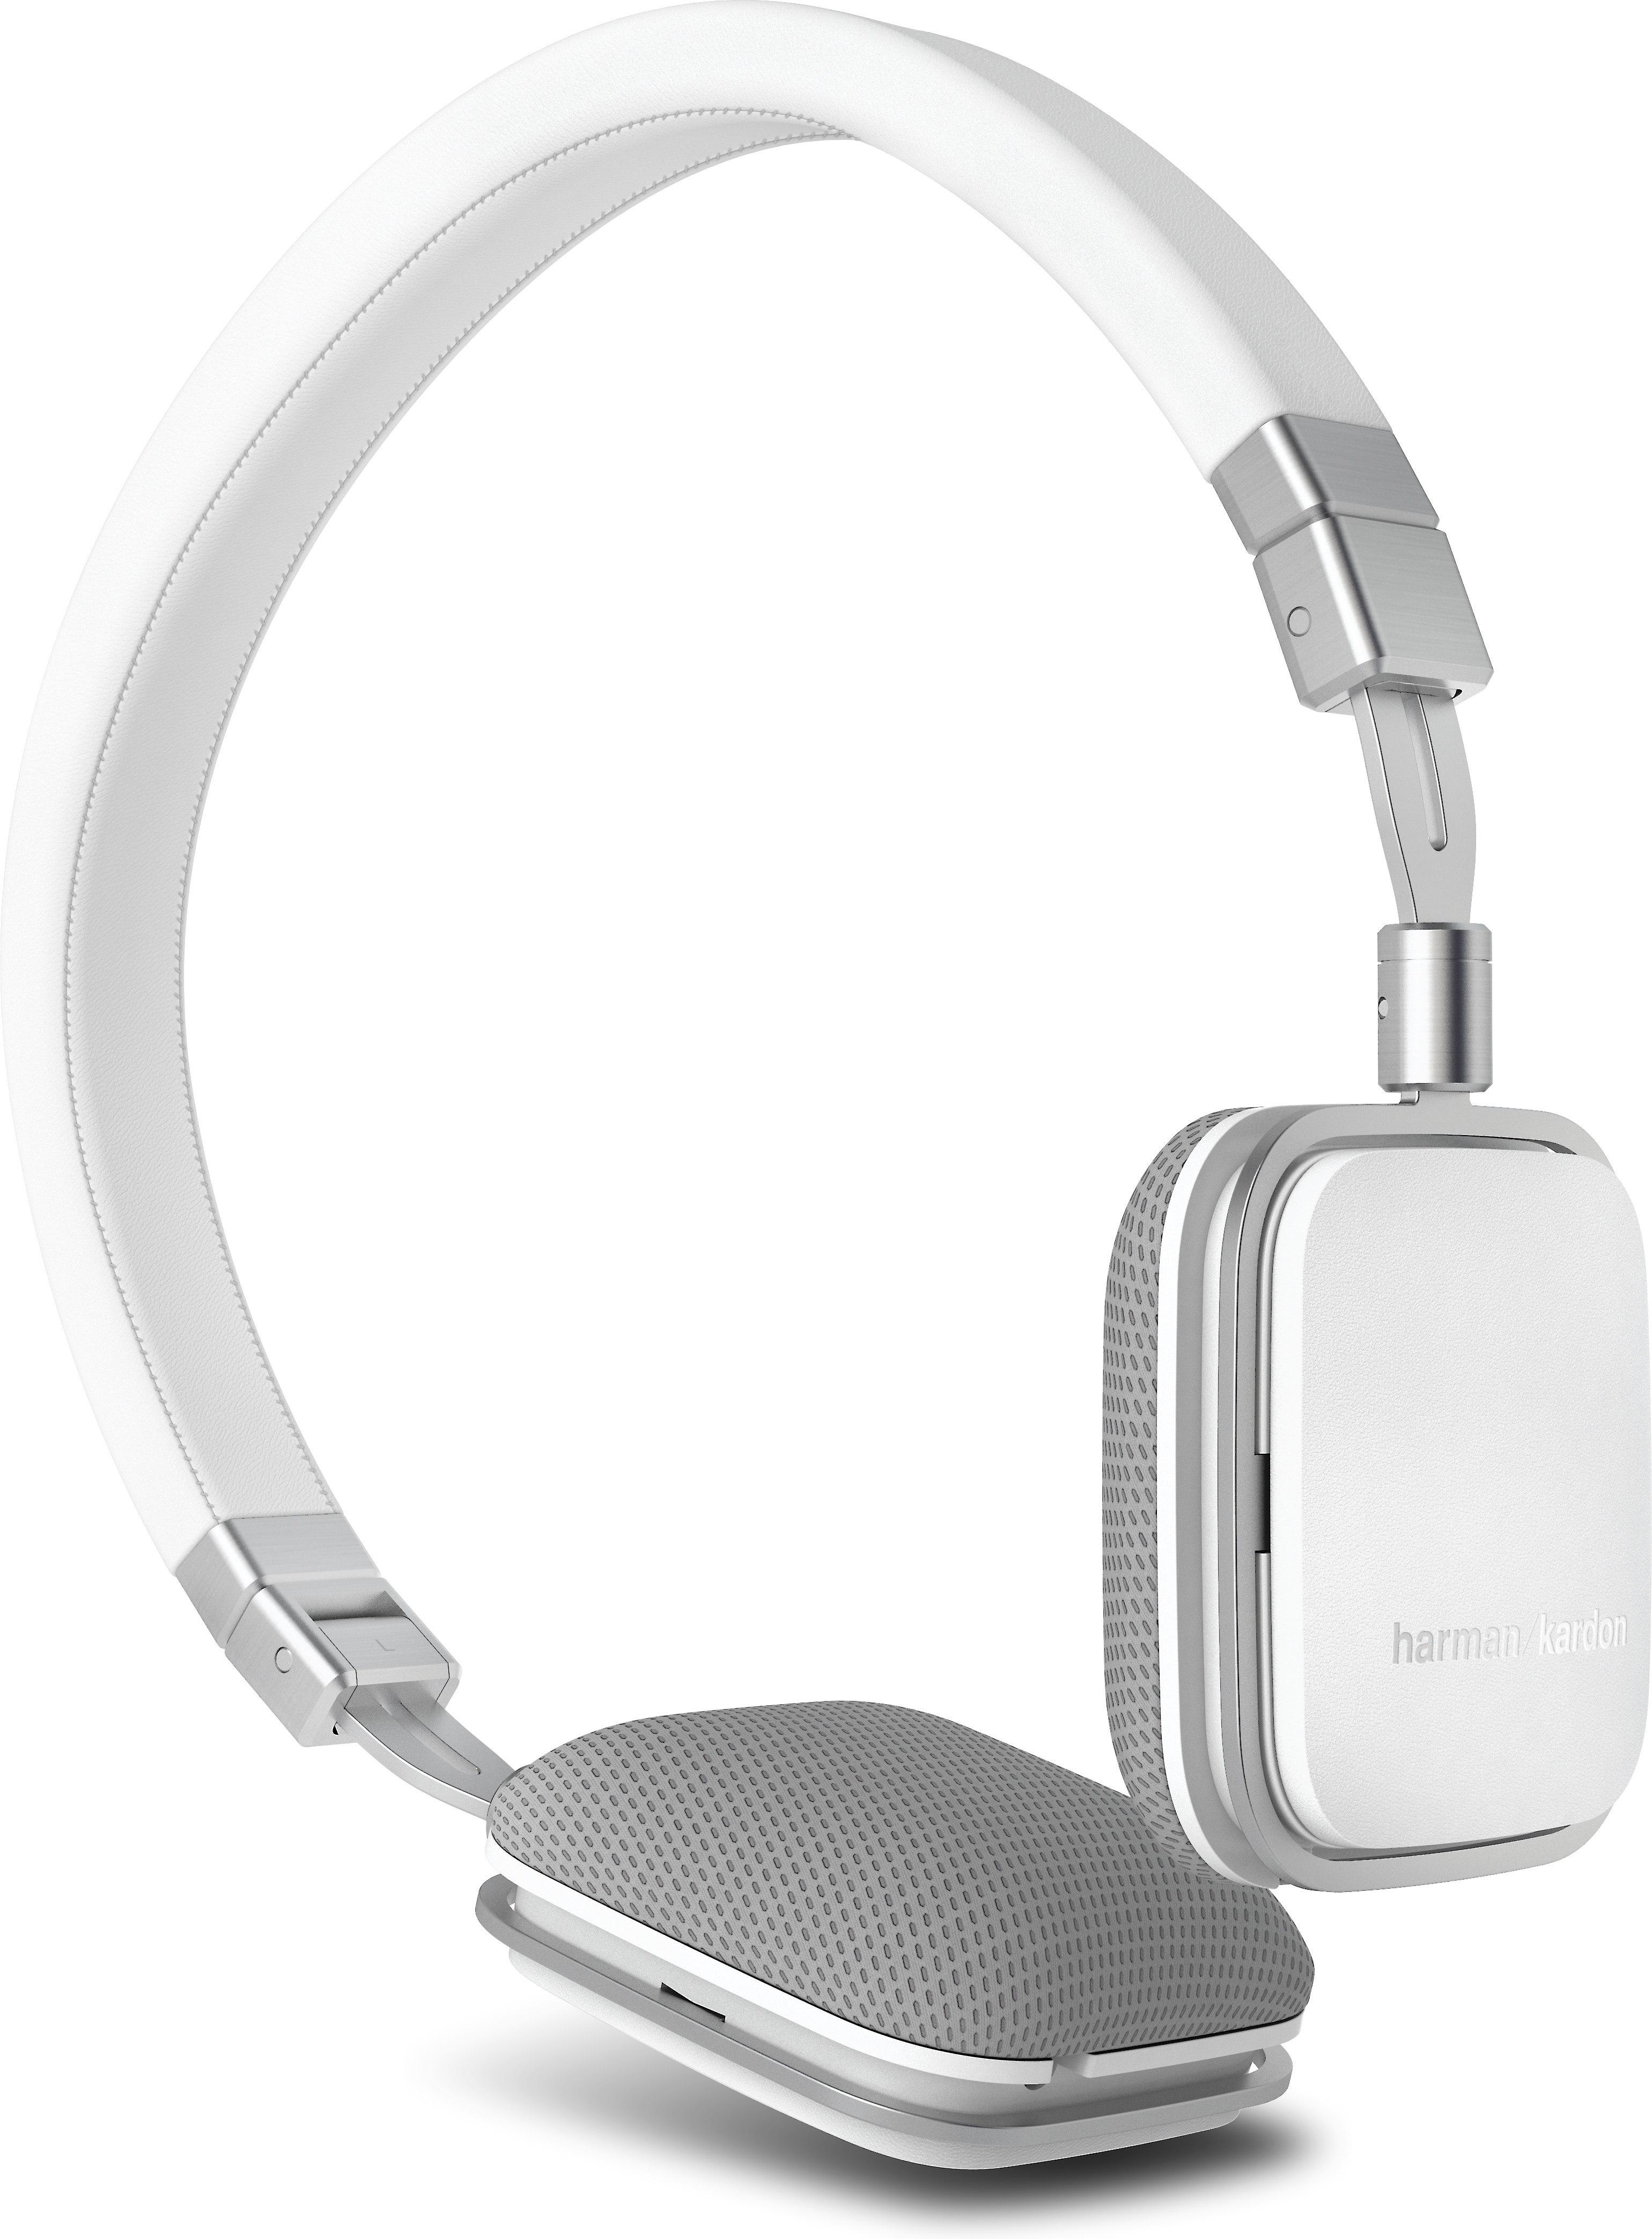 6cd0266dc1f Harman Kardon Soho-I (White) On-ear headphones for iPhone® at  Crutchfield.com